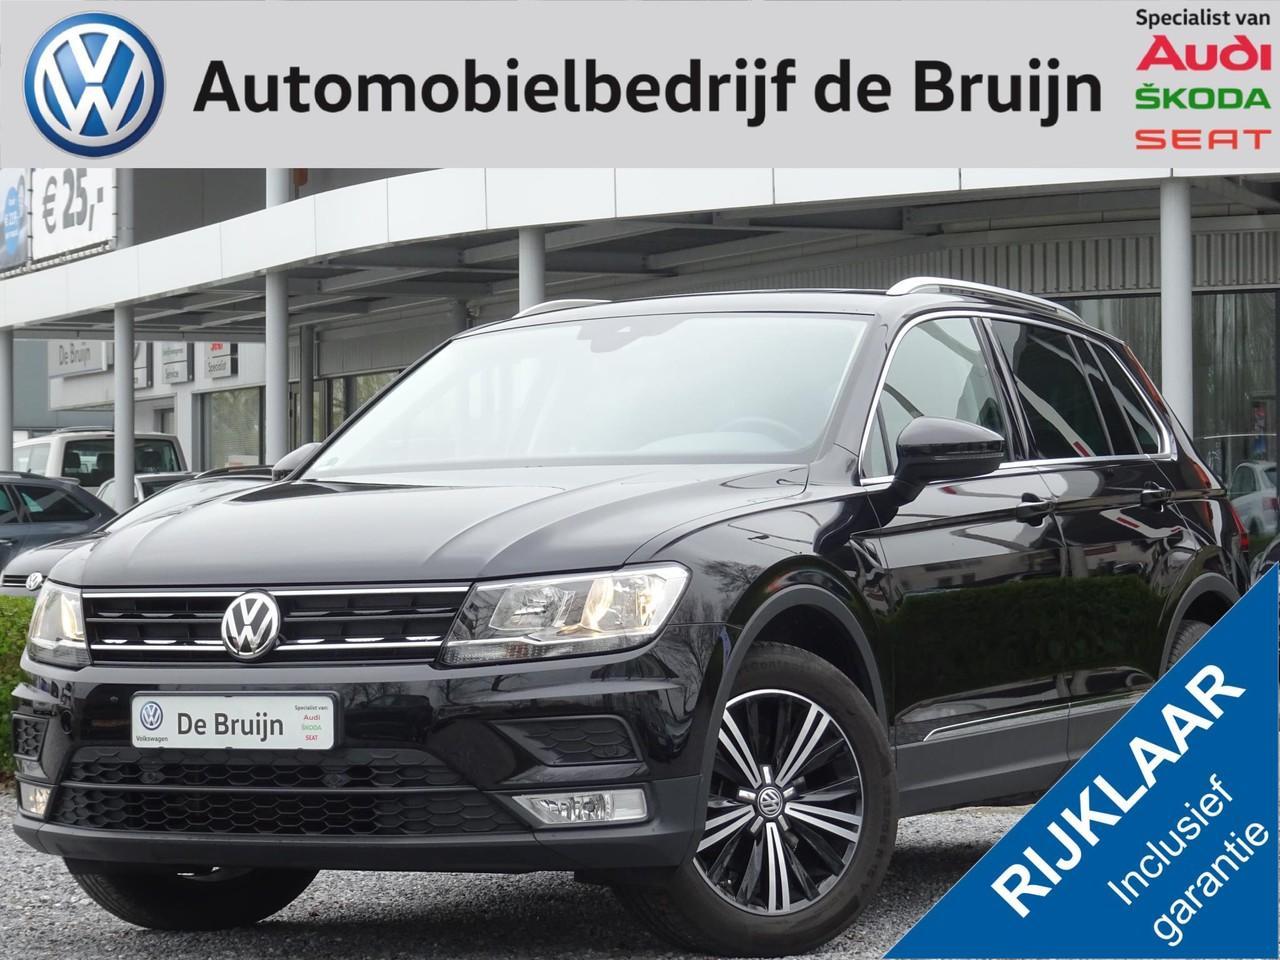 Volkswagen Tiguan 1.4 tsi 150pk dsg comfortline (panoramadak,navi,pdc,lm)